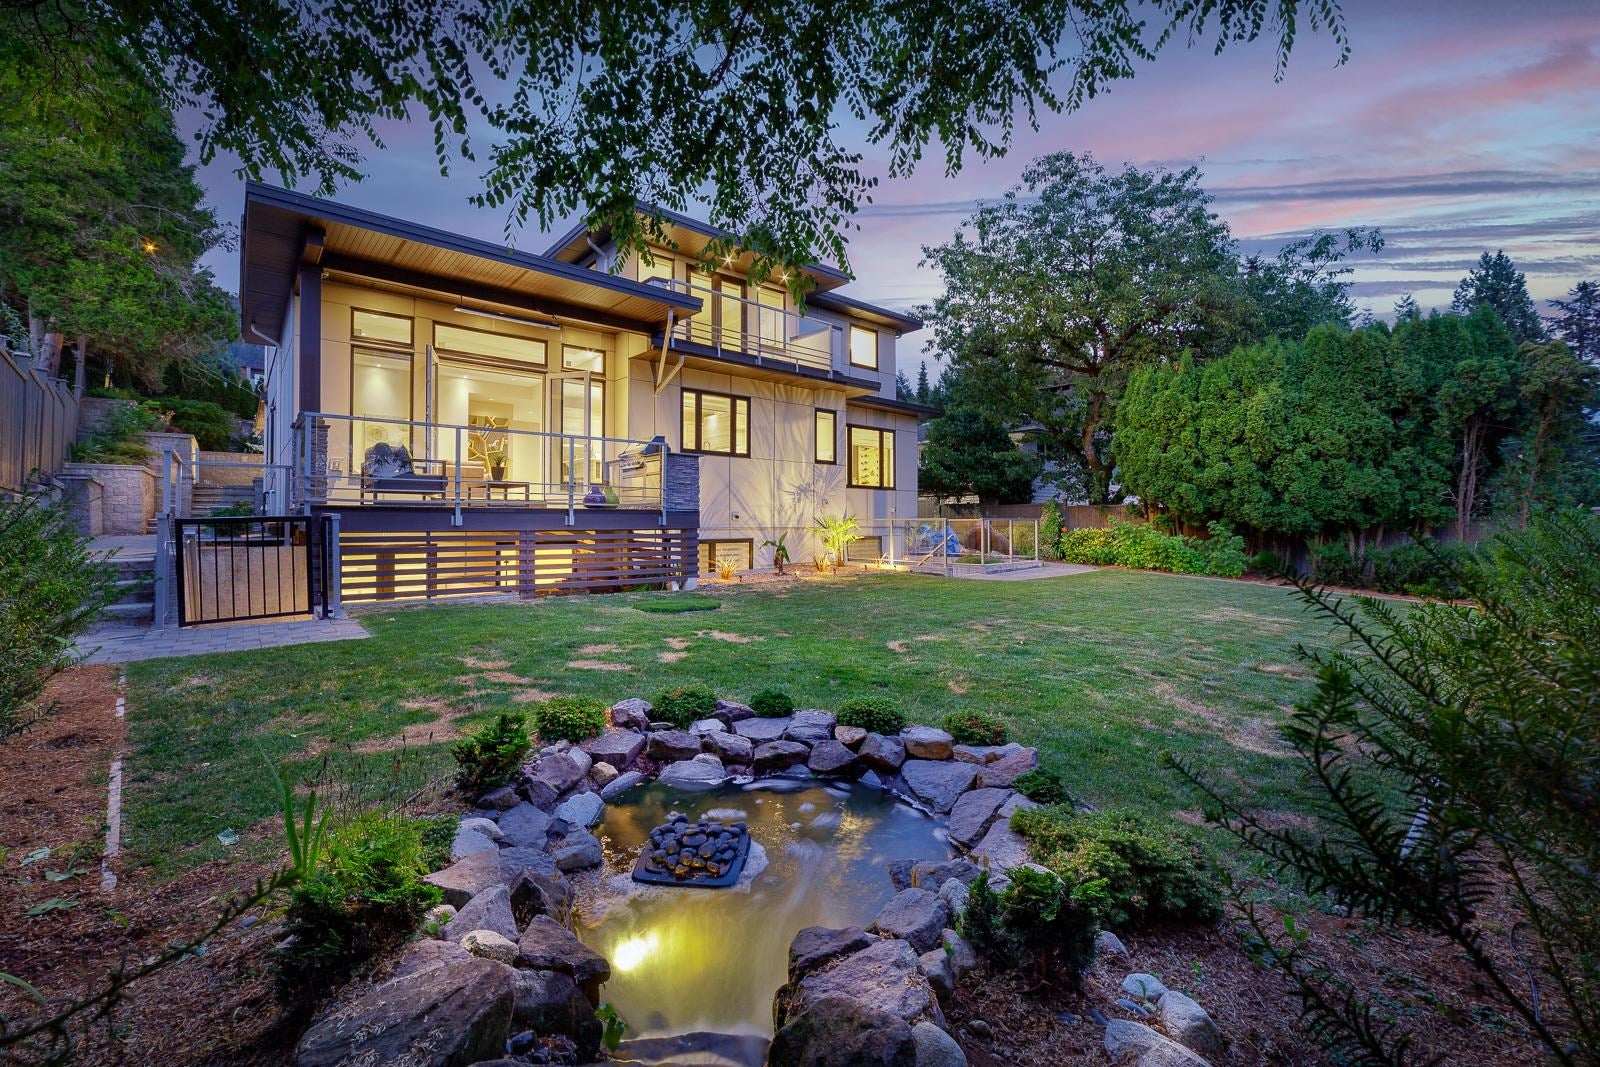 517 GRANADA CRESCENT - Upper Delbrook House/Single Family for sale, 8 Bedrooms (R2615057) - #34